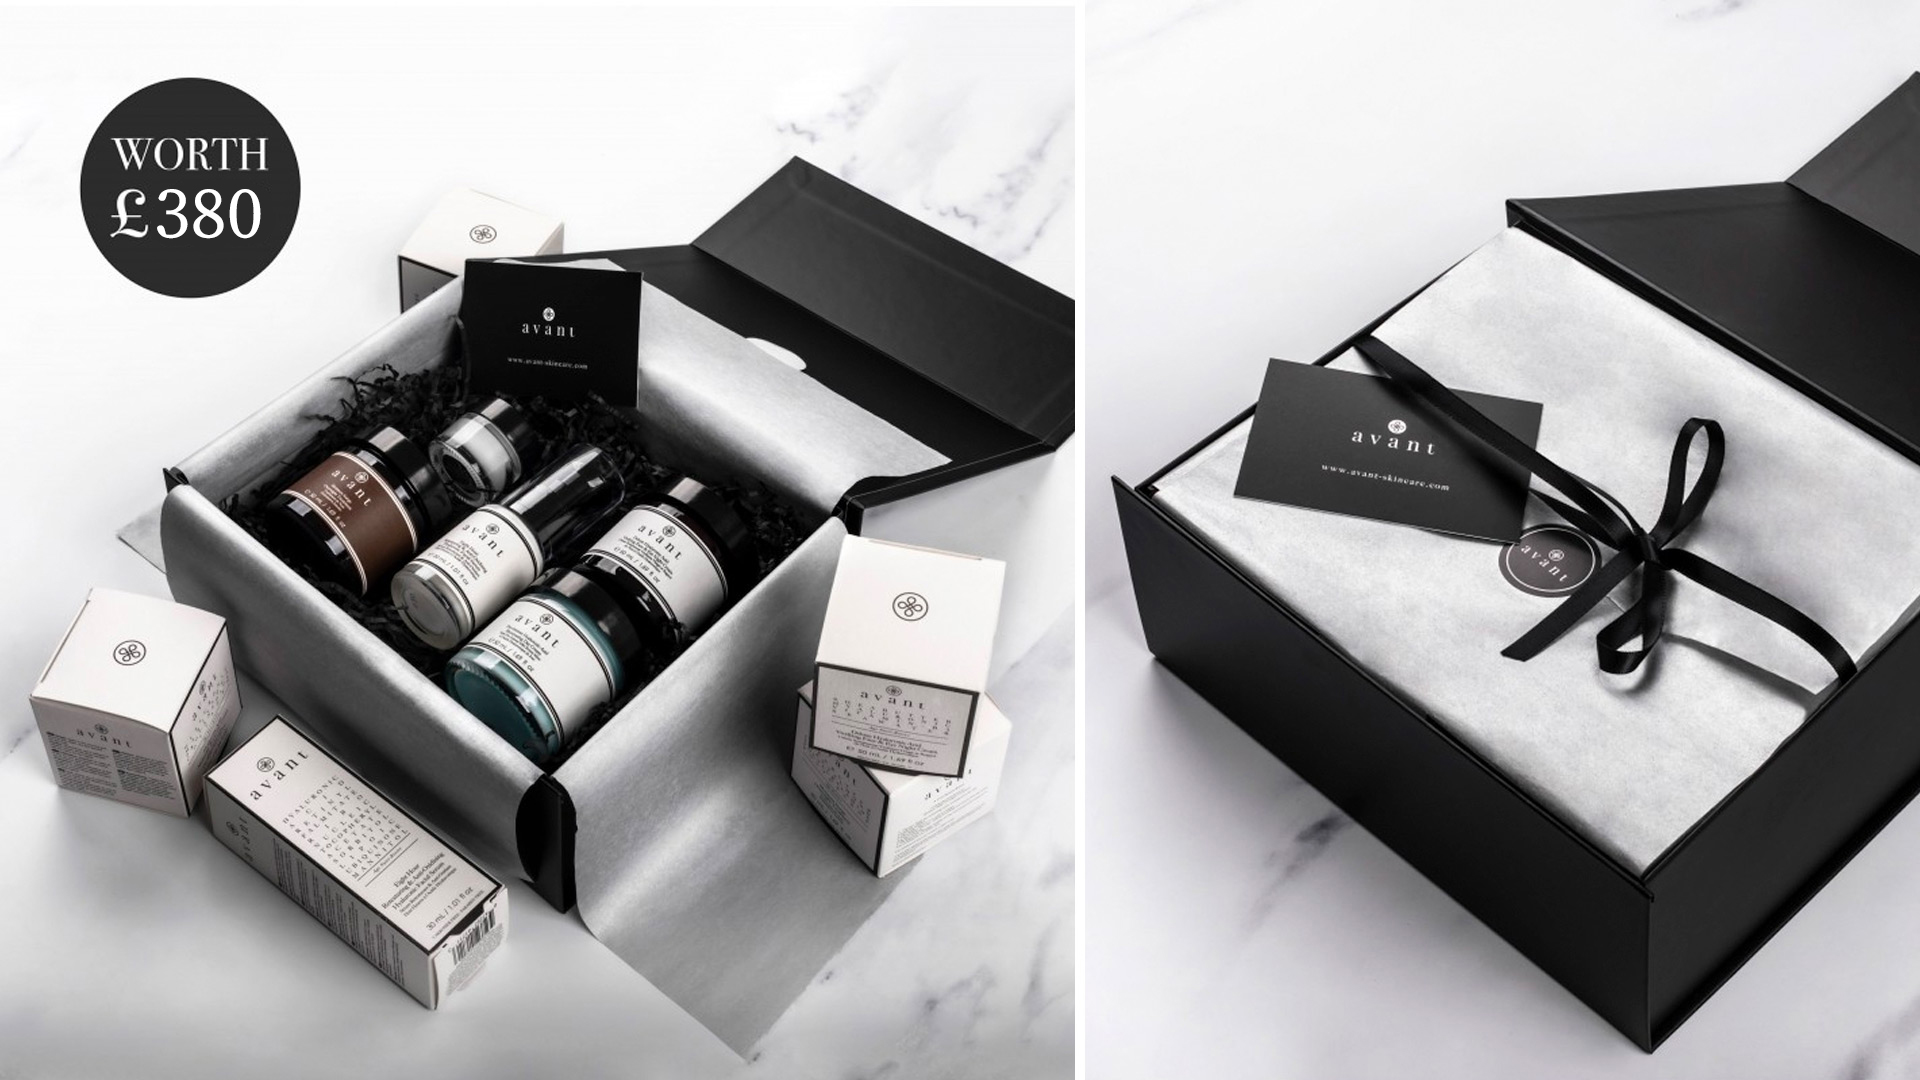 Win an Avant Skincare Gift Box – 5-Step Skincare Routine, Worth £380!